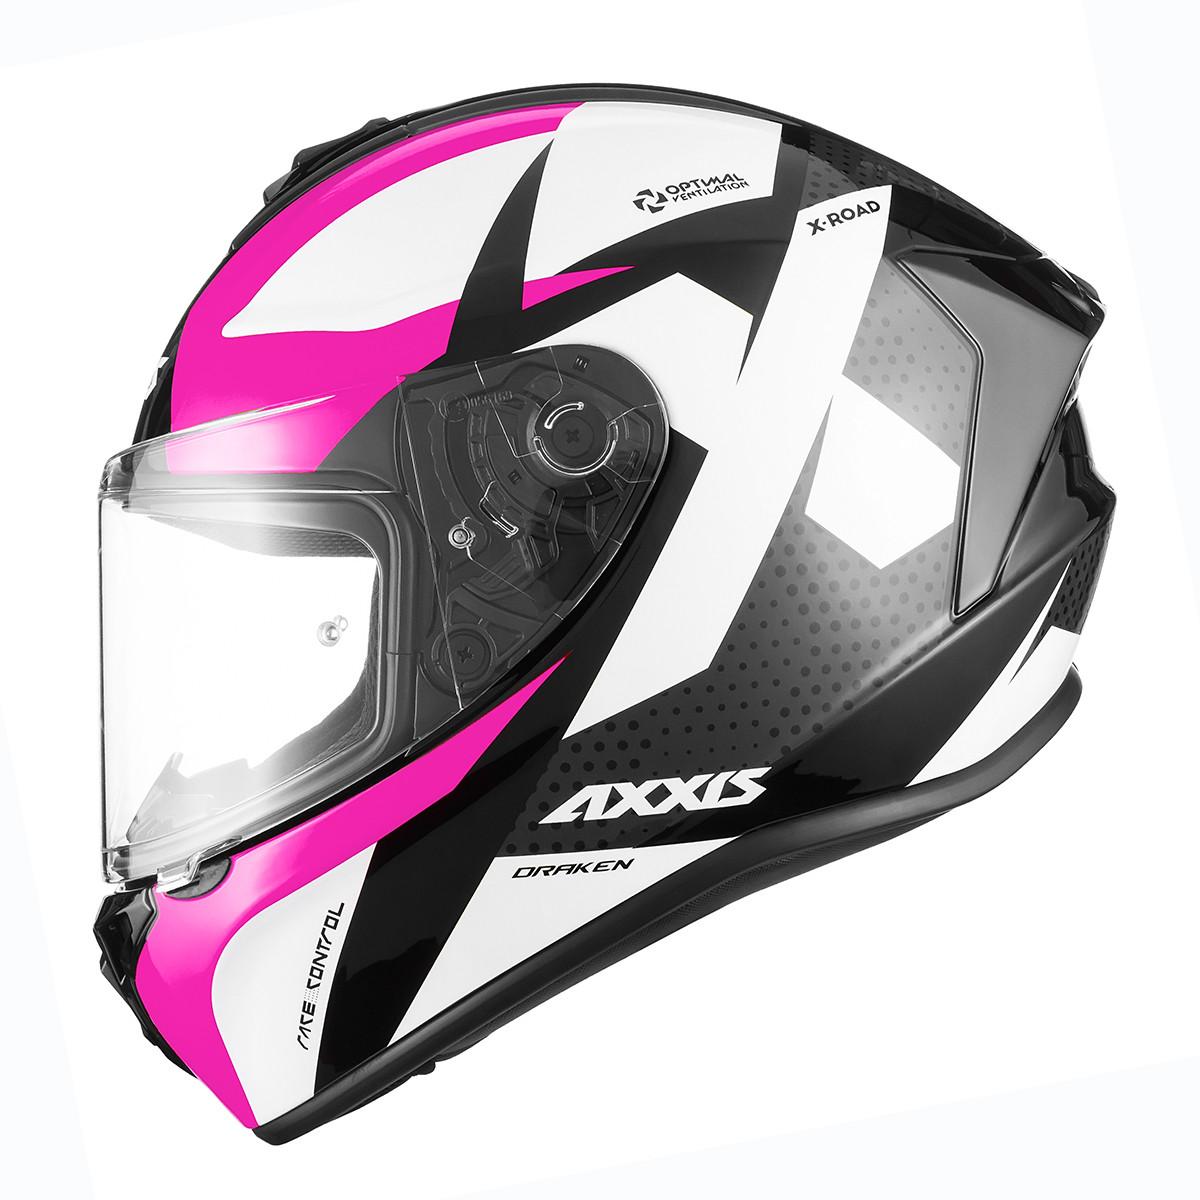 Casco Integral Axxis Draken X-road B3 Rosa